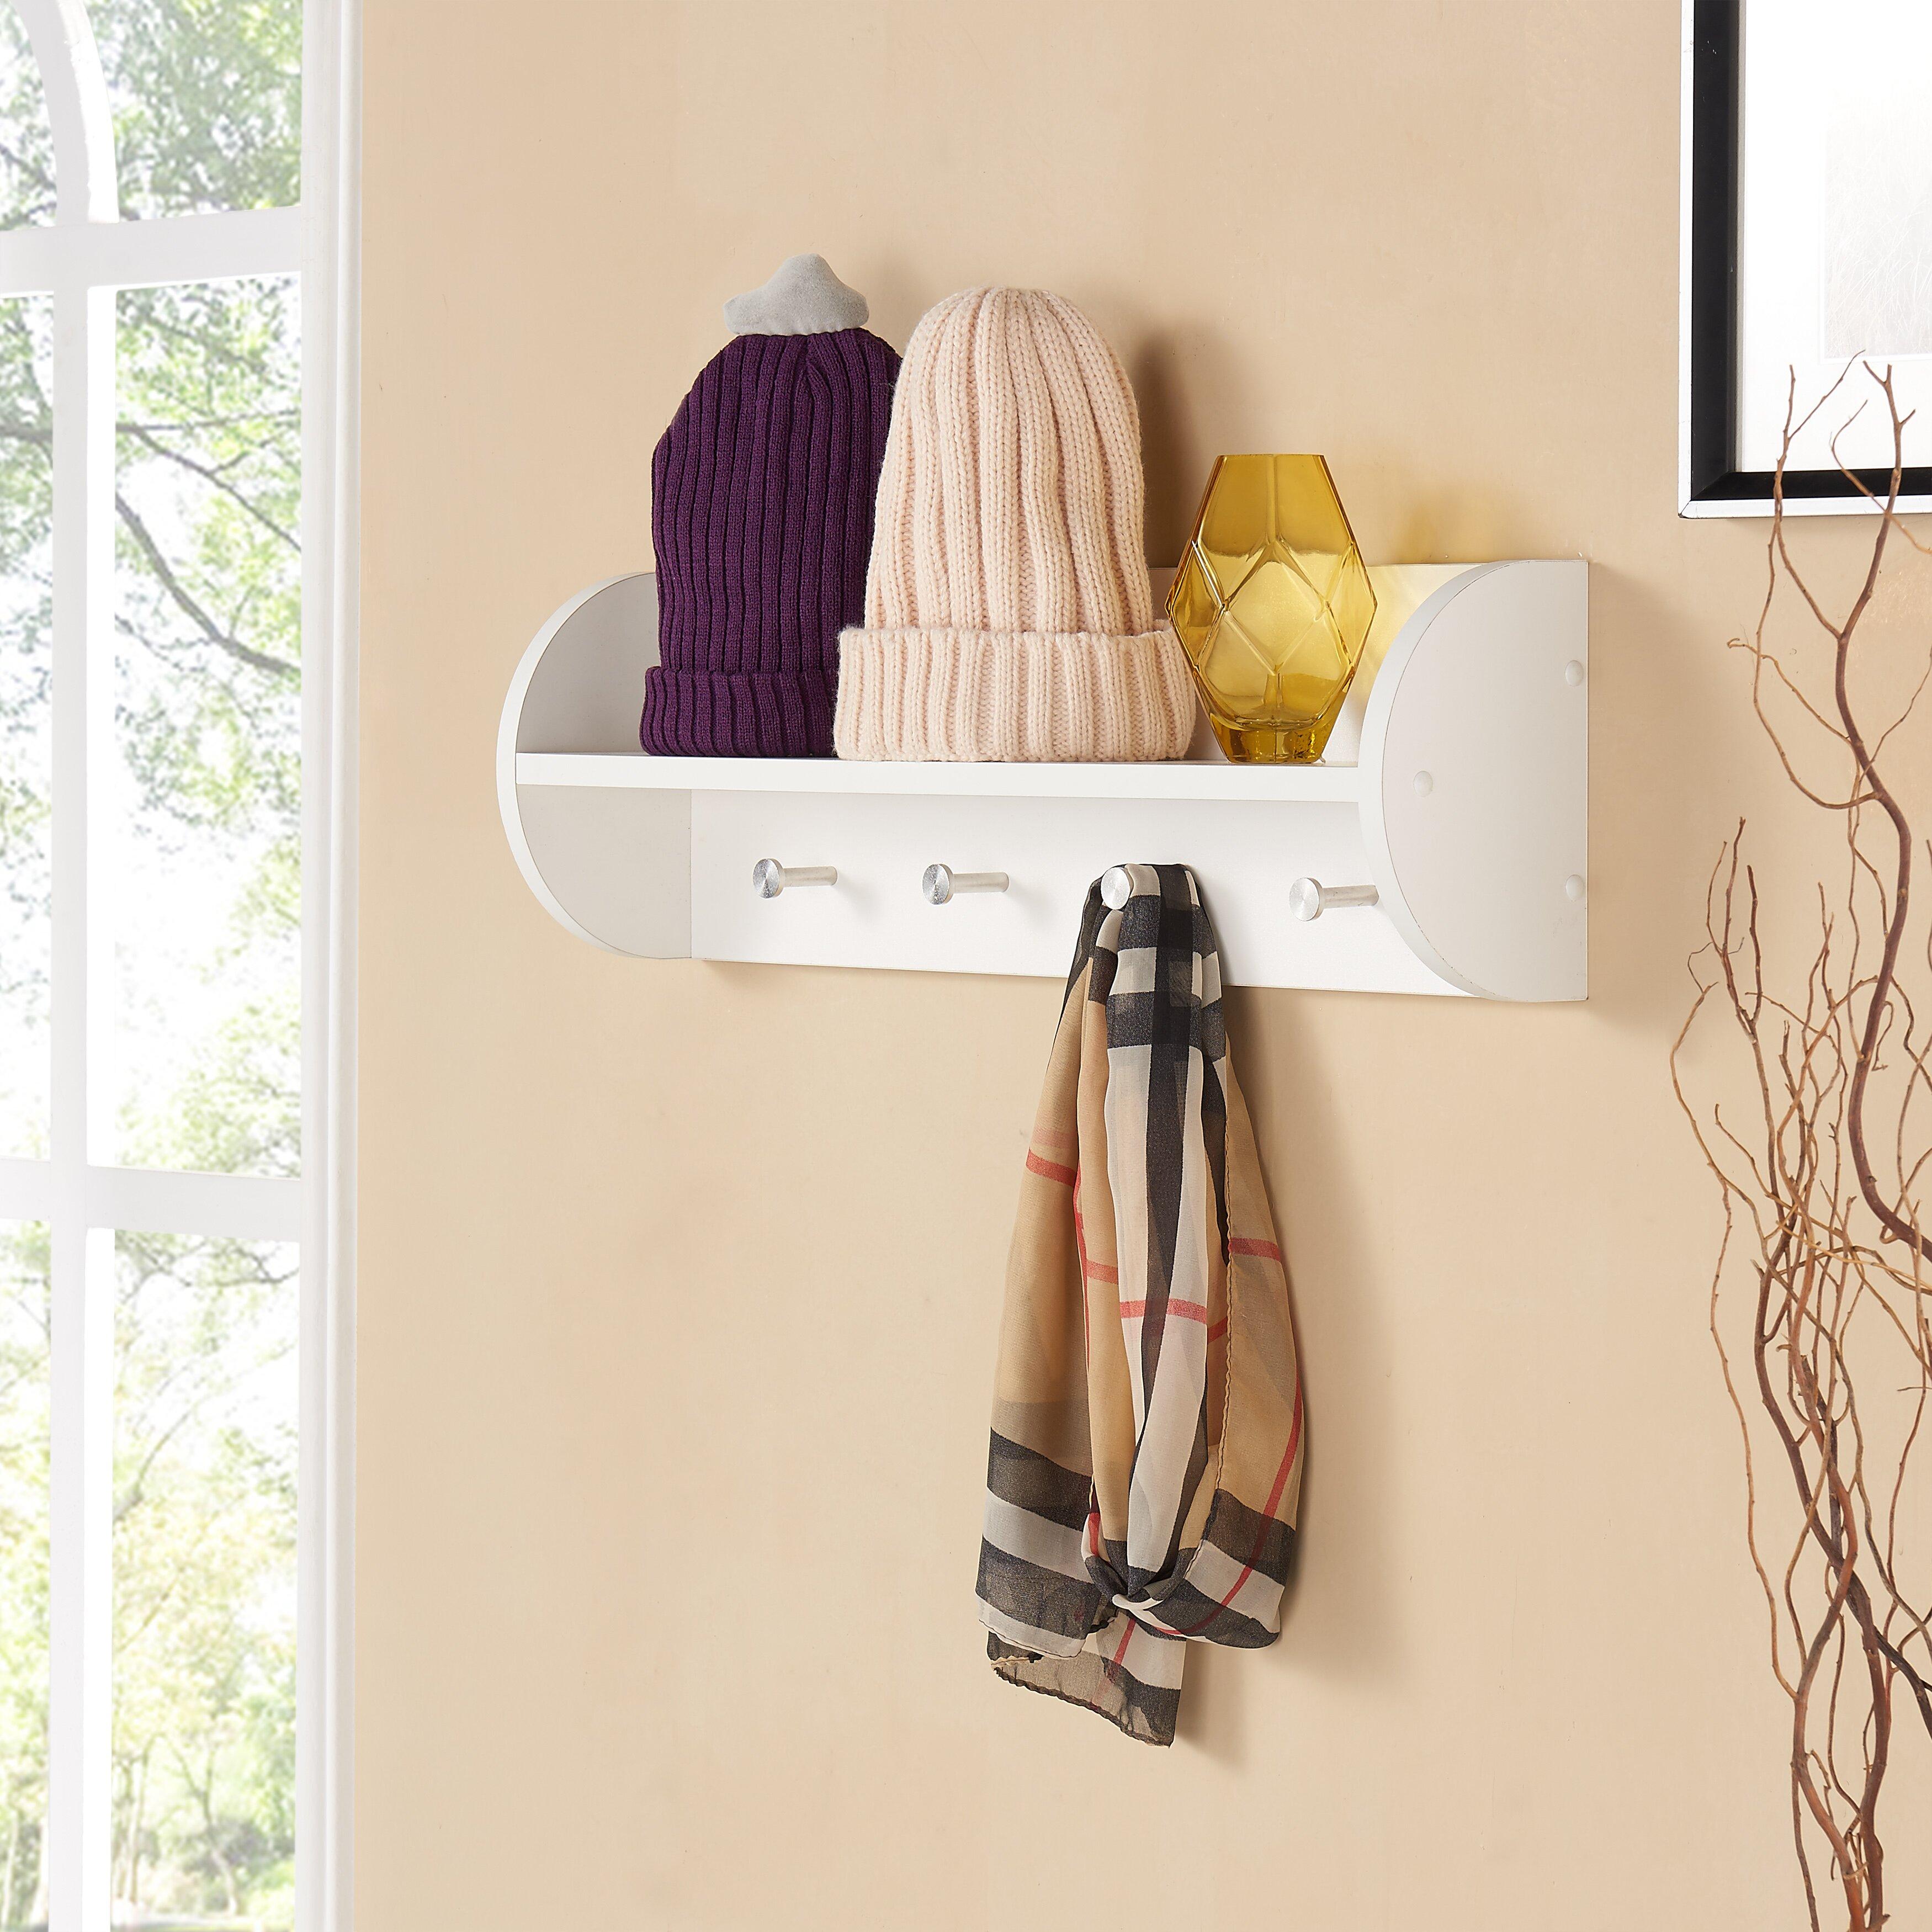 danyab wall mounted coat rack utility shelf reviews wayfair. Black Bedroom Furniture Sets. Home Design Ideas